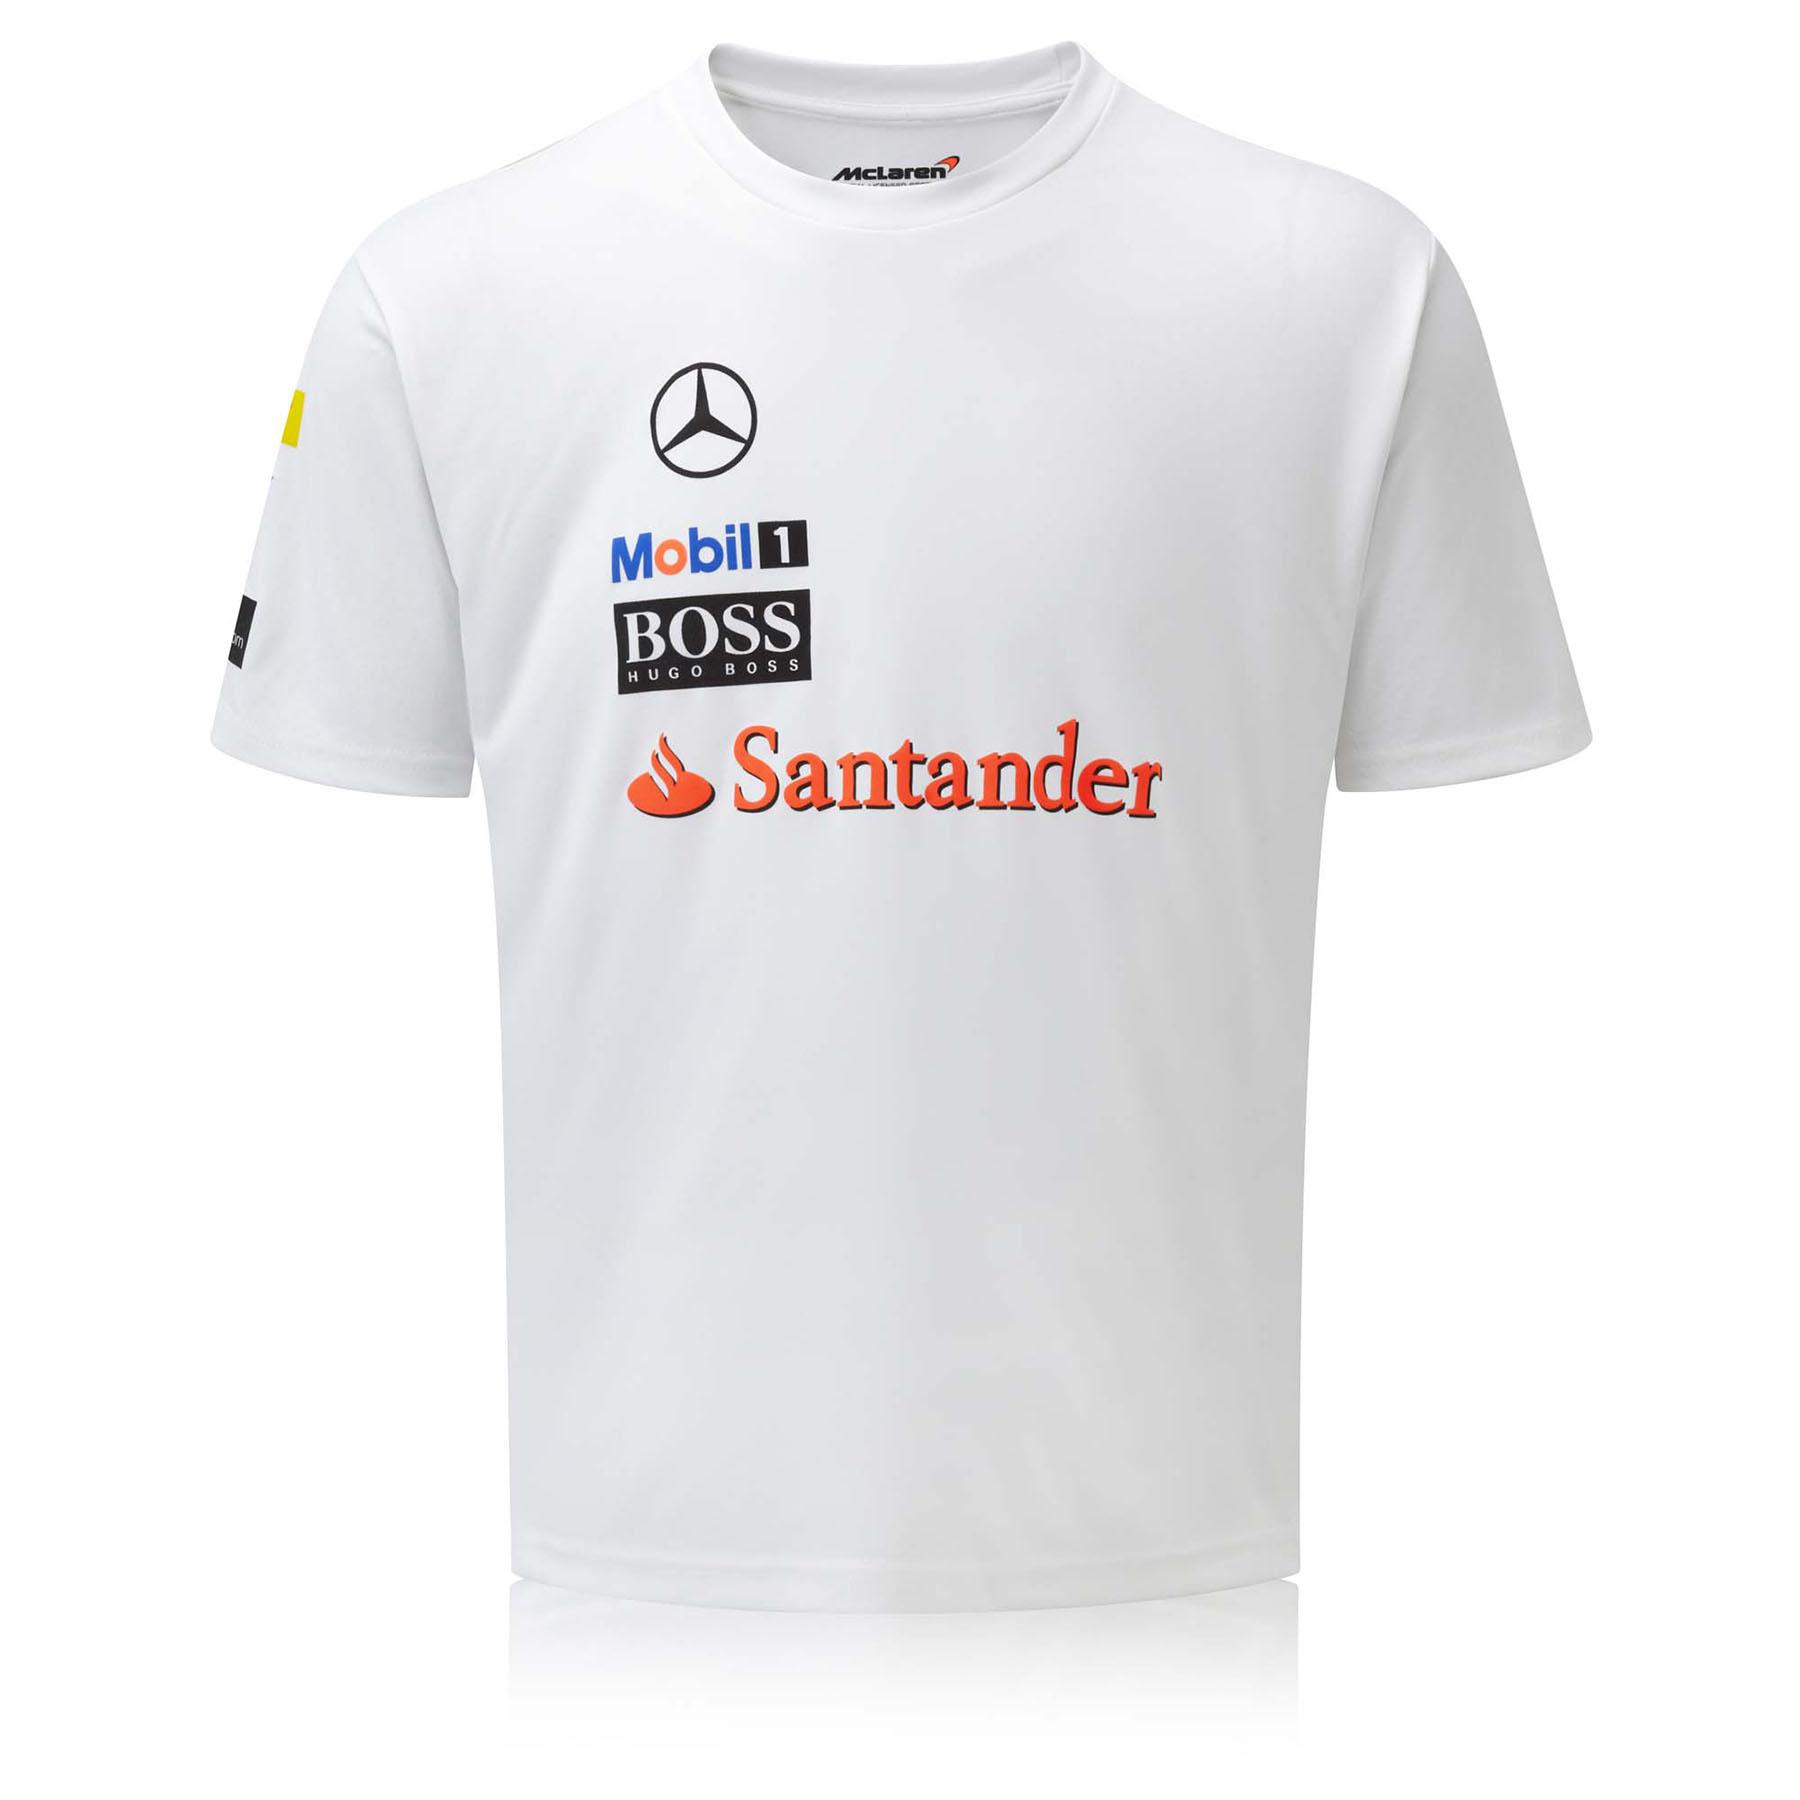 McLaren Mercedes 2014 Sponsor T-Shirt